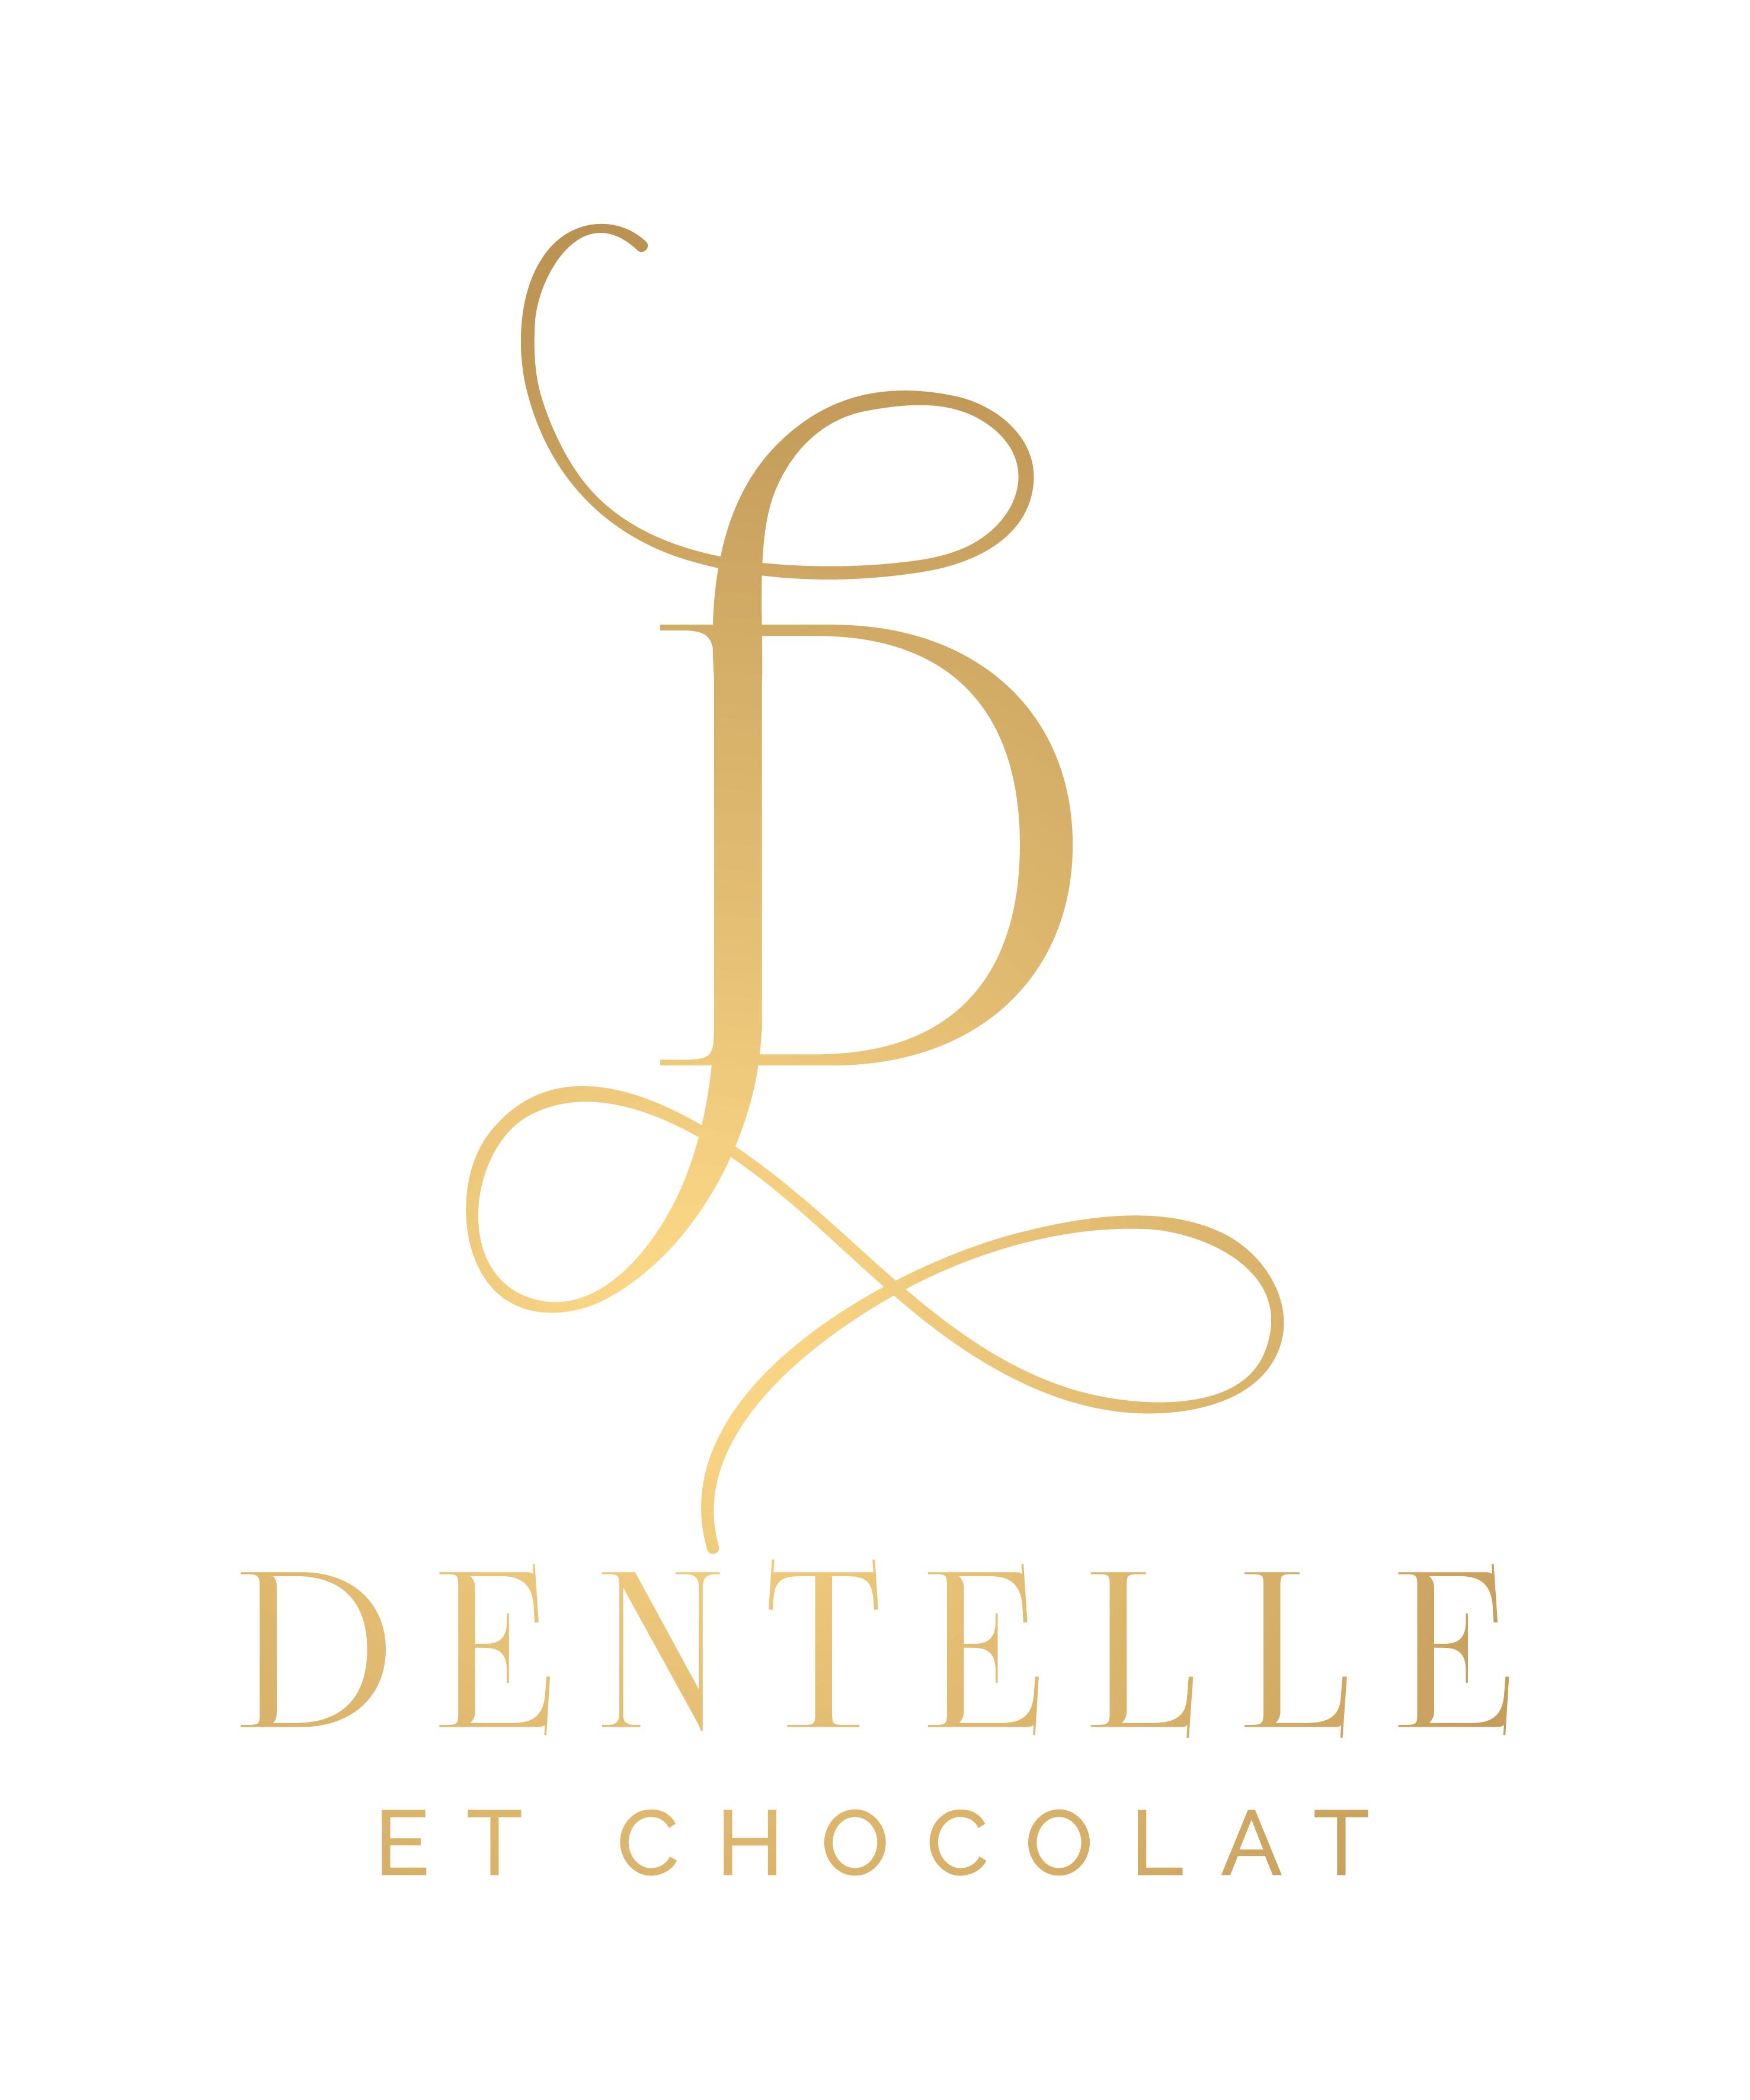 Dentelle et Chocolat Logo